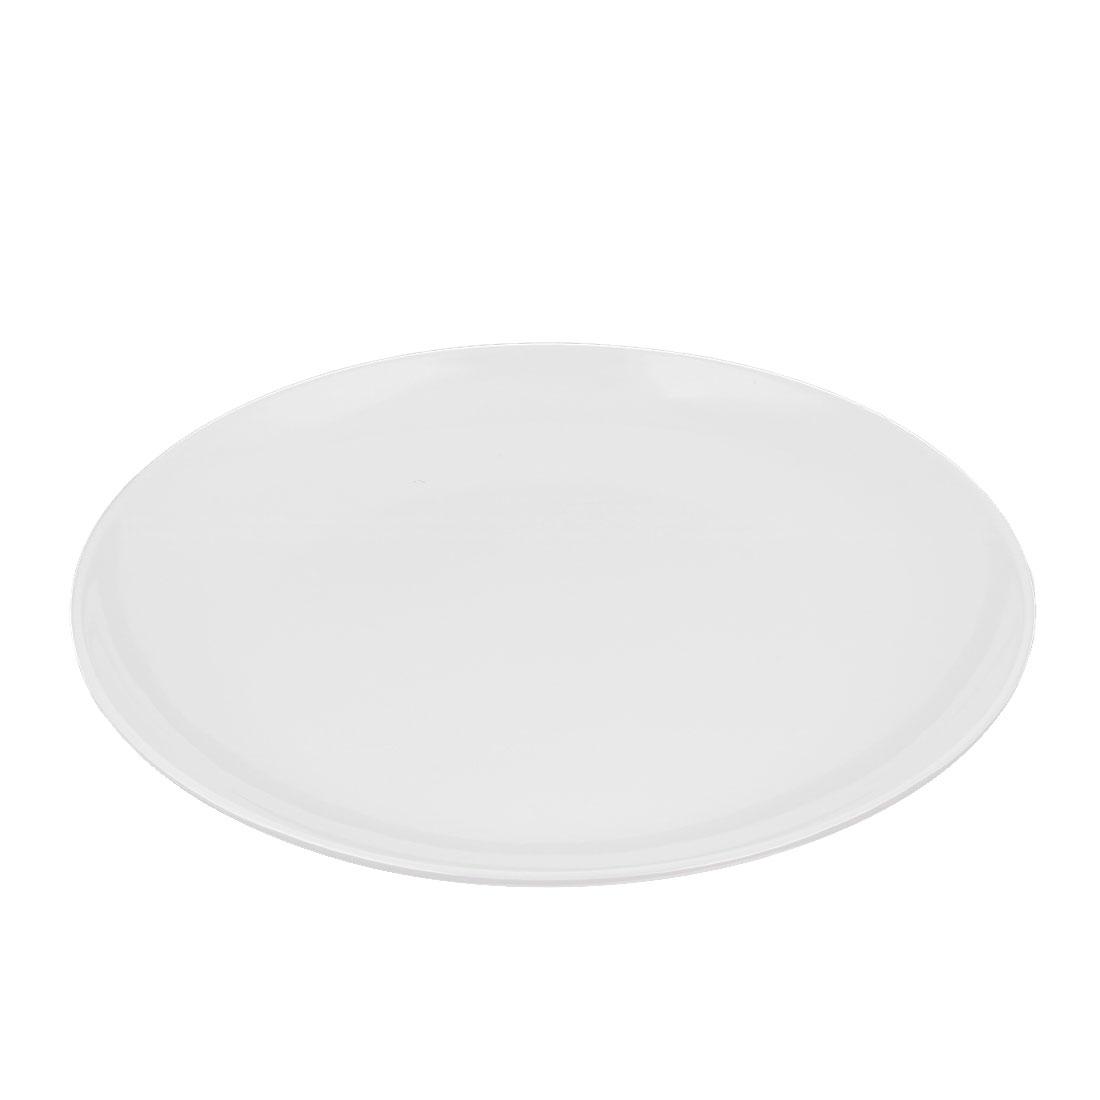 Dinnerware Plastic Round Shape Dish Food Container Plate White 28 x 2.5cm